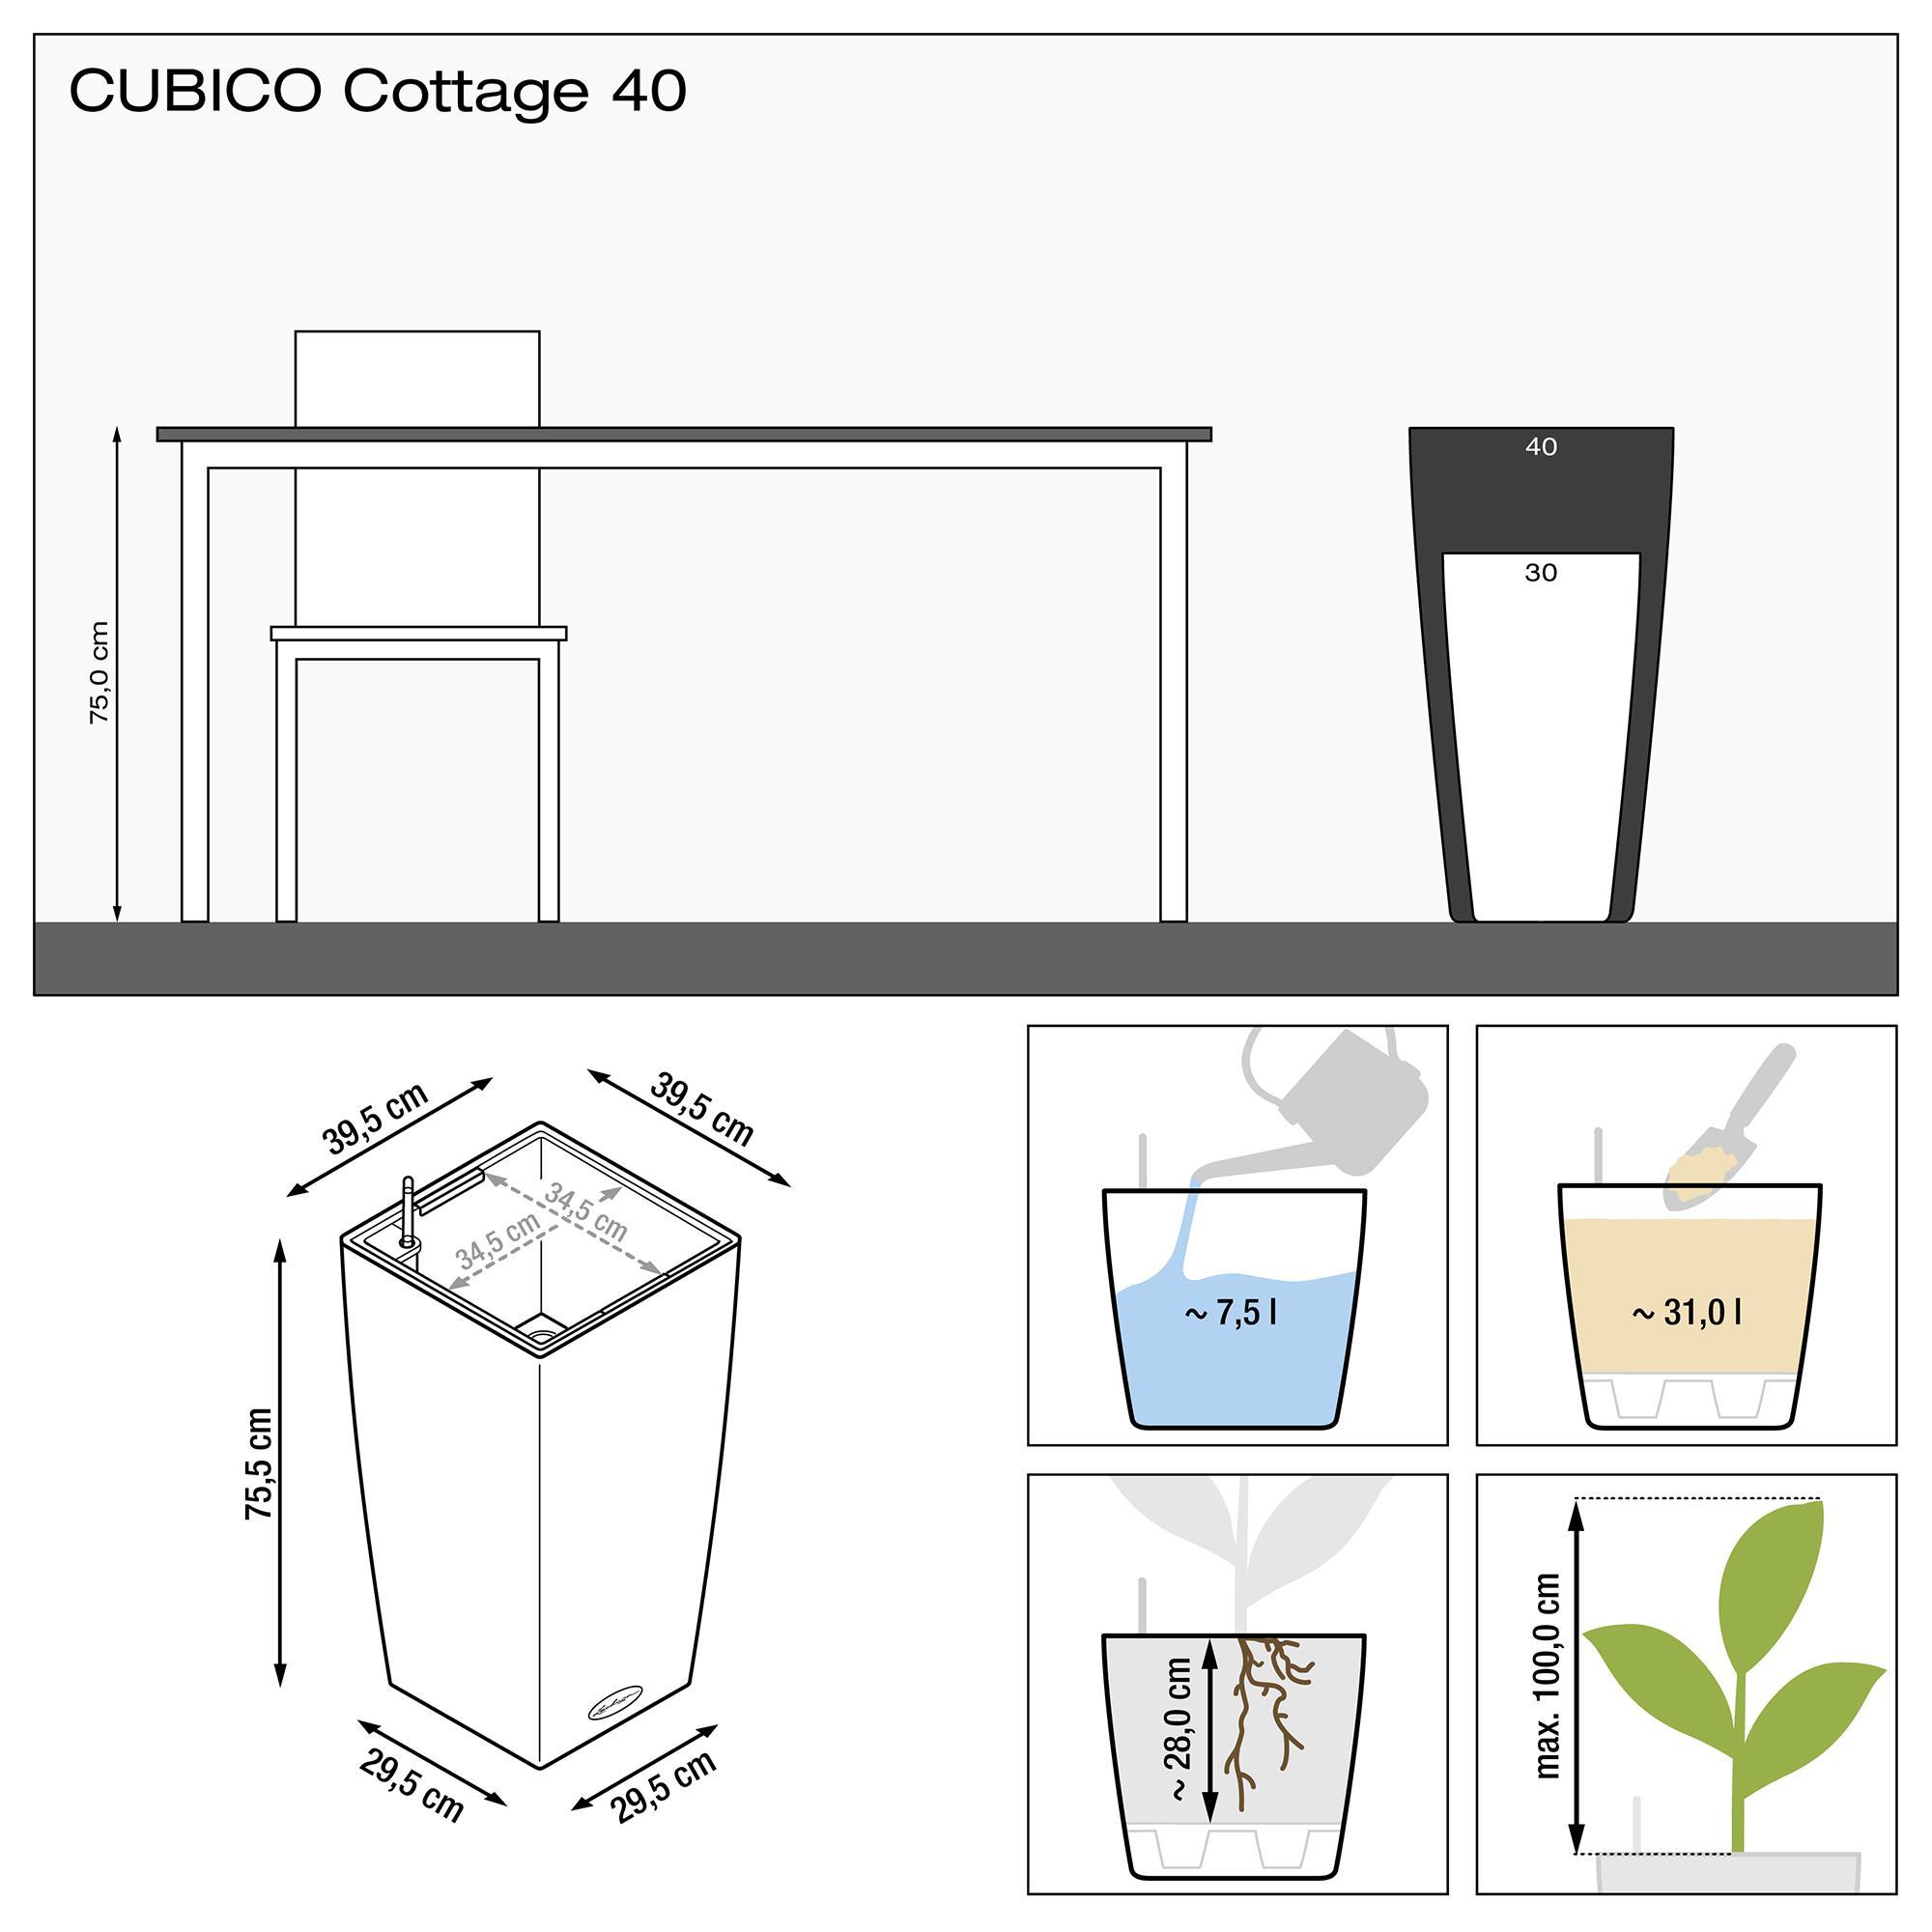 CUBICO Cottage 40 mocha - Image 3